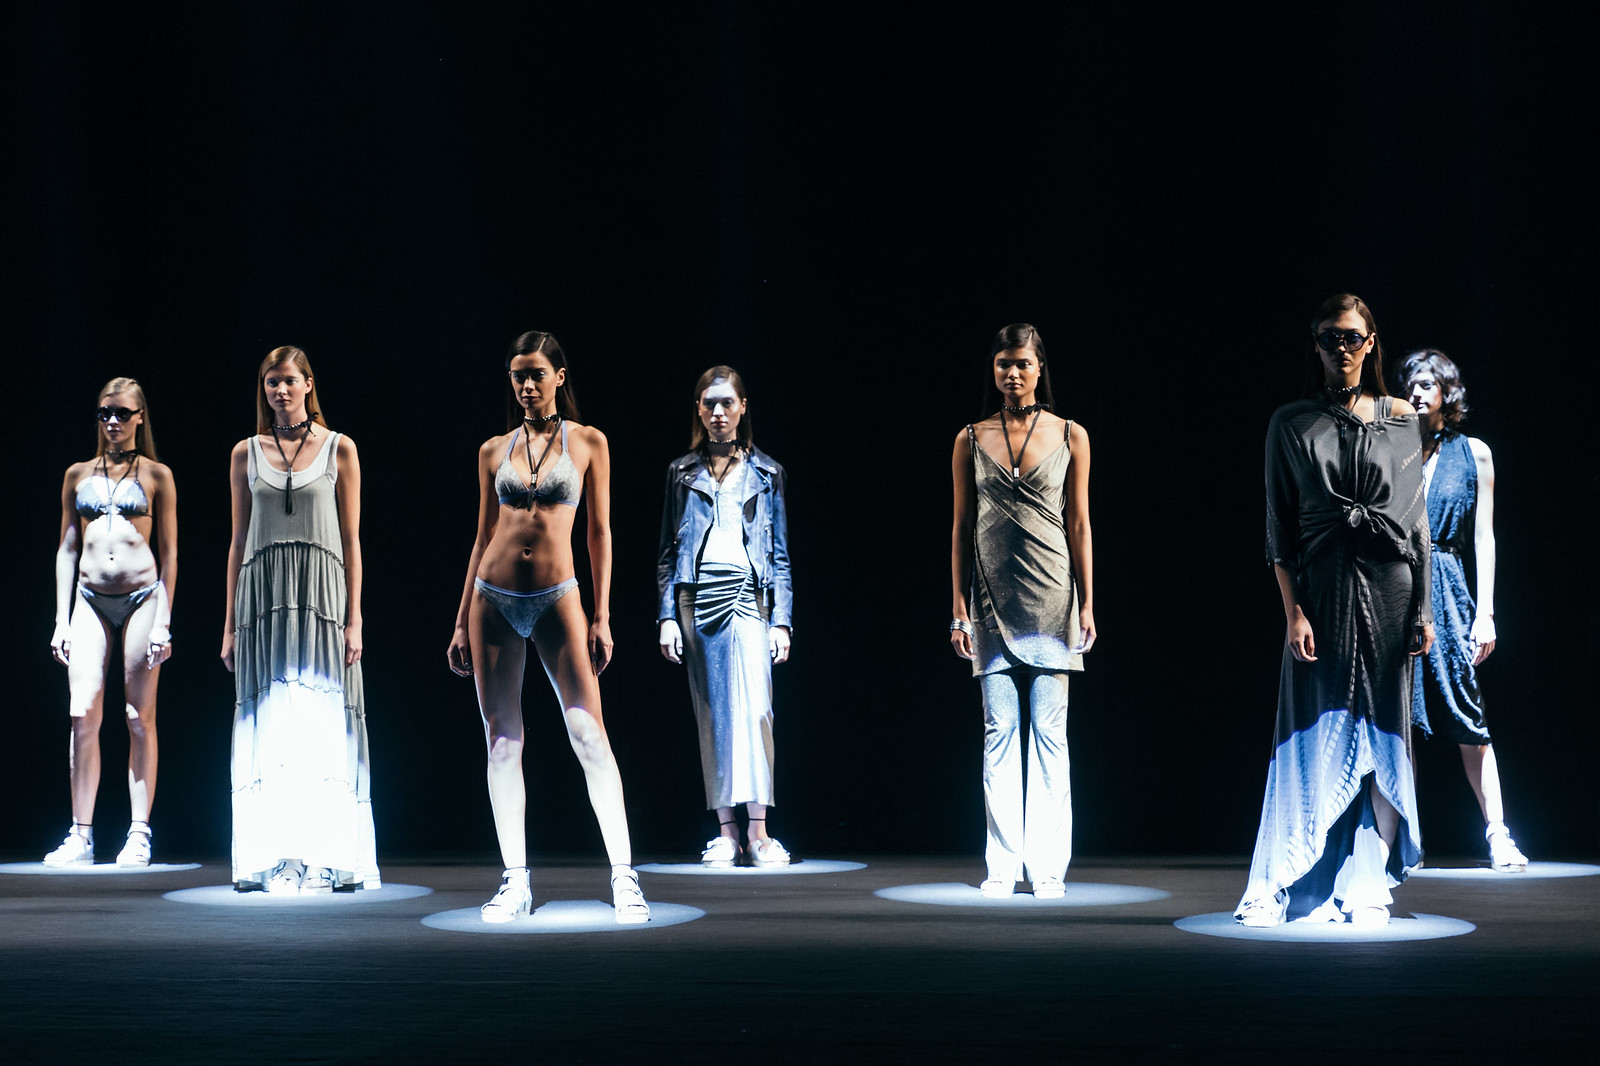 Jessie Chanes - Seams for a desire - 080 Bacelona Fashion #080bcnfasion -38